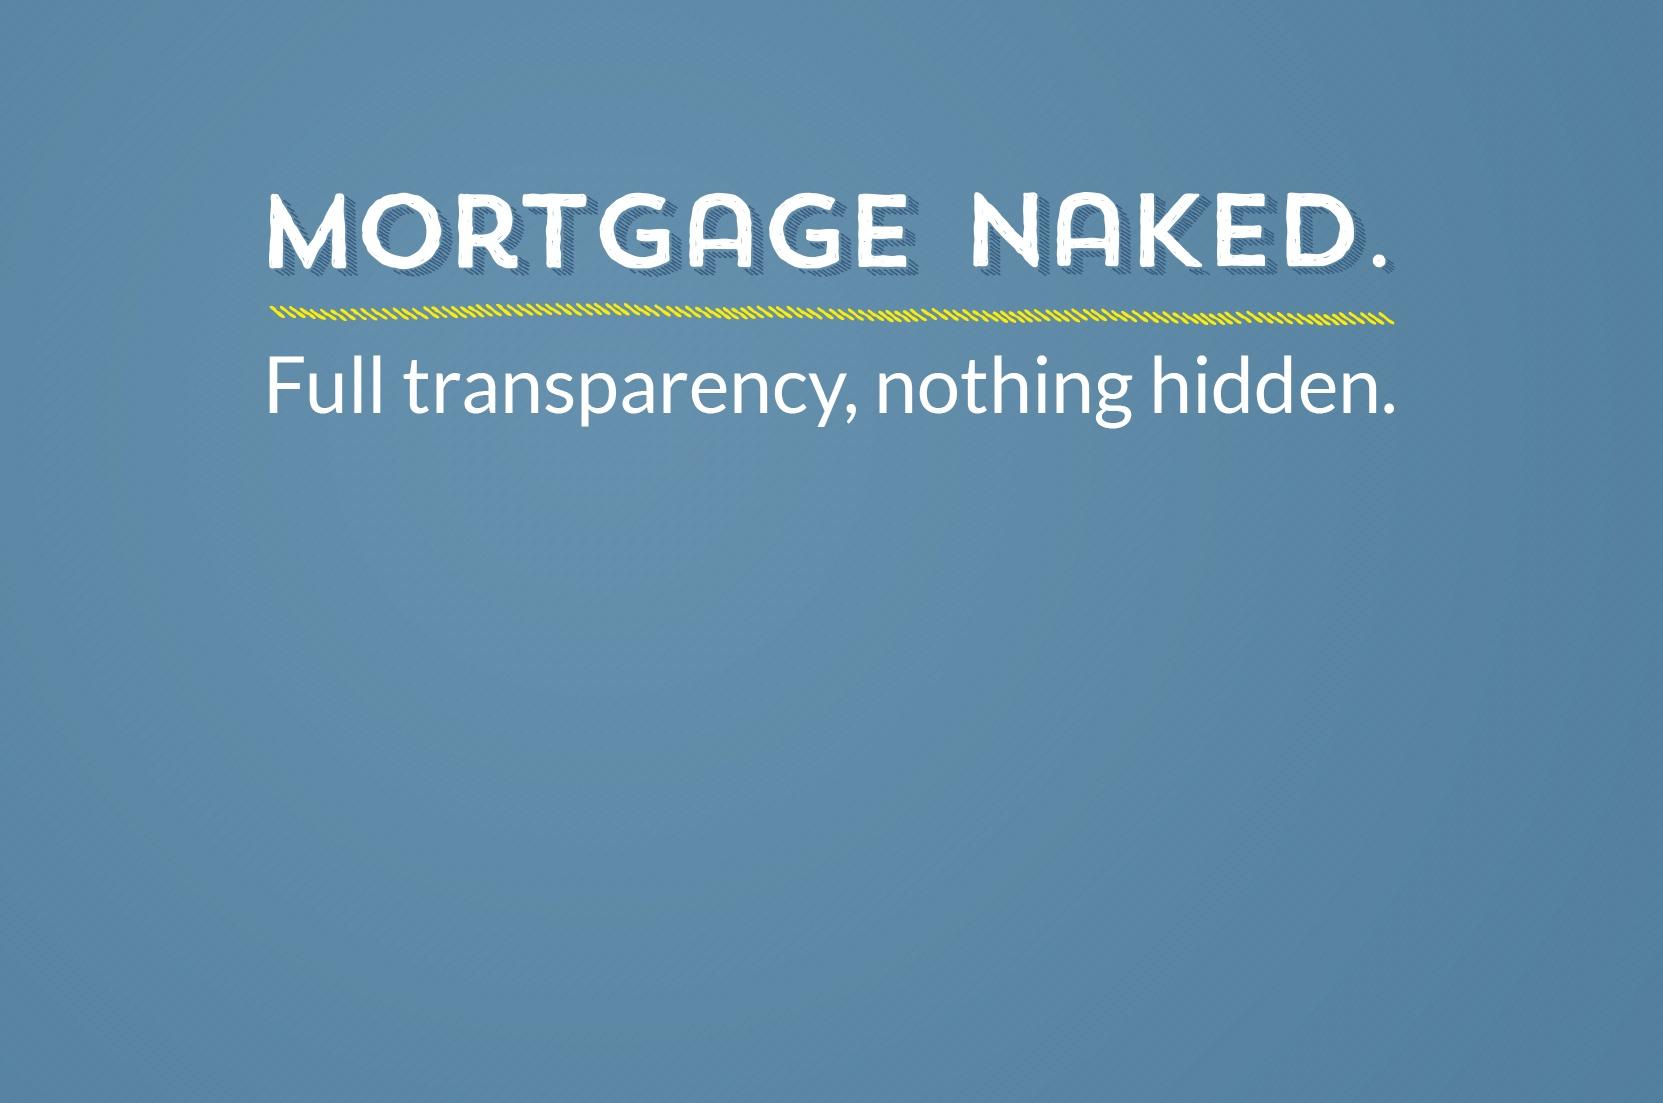 Mortgage Naked Header